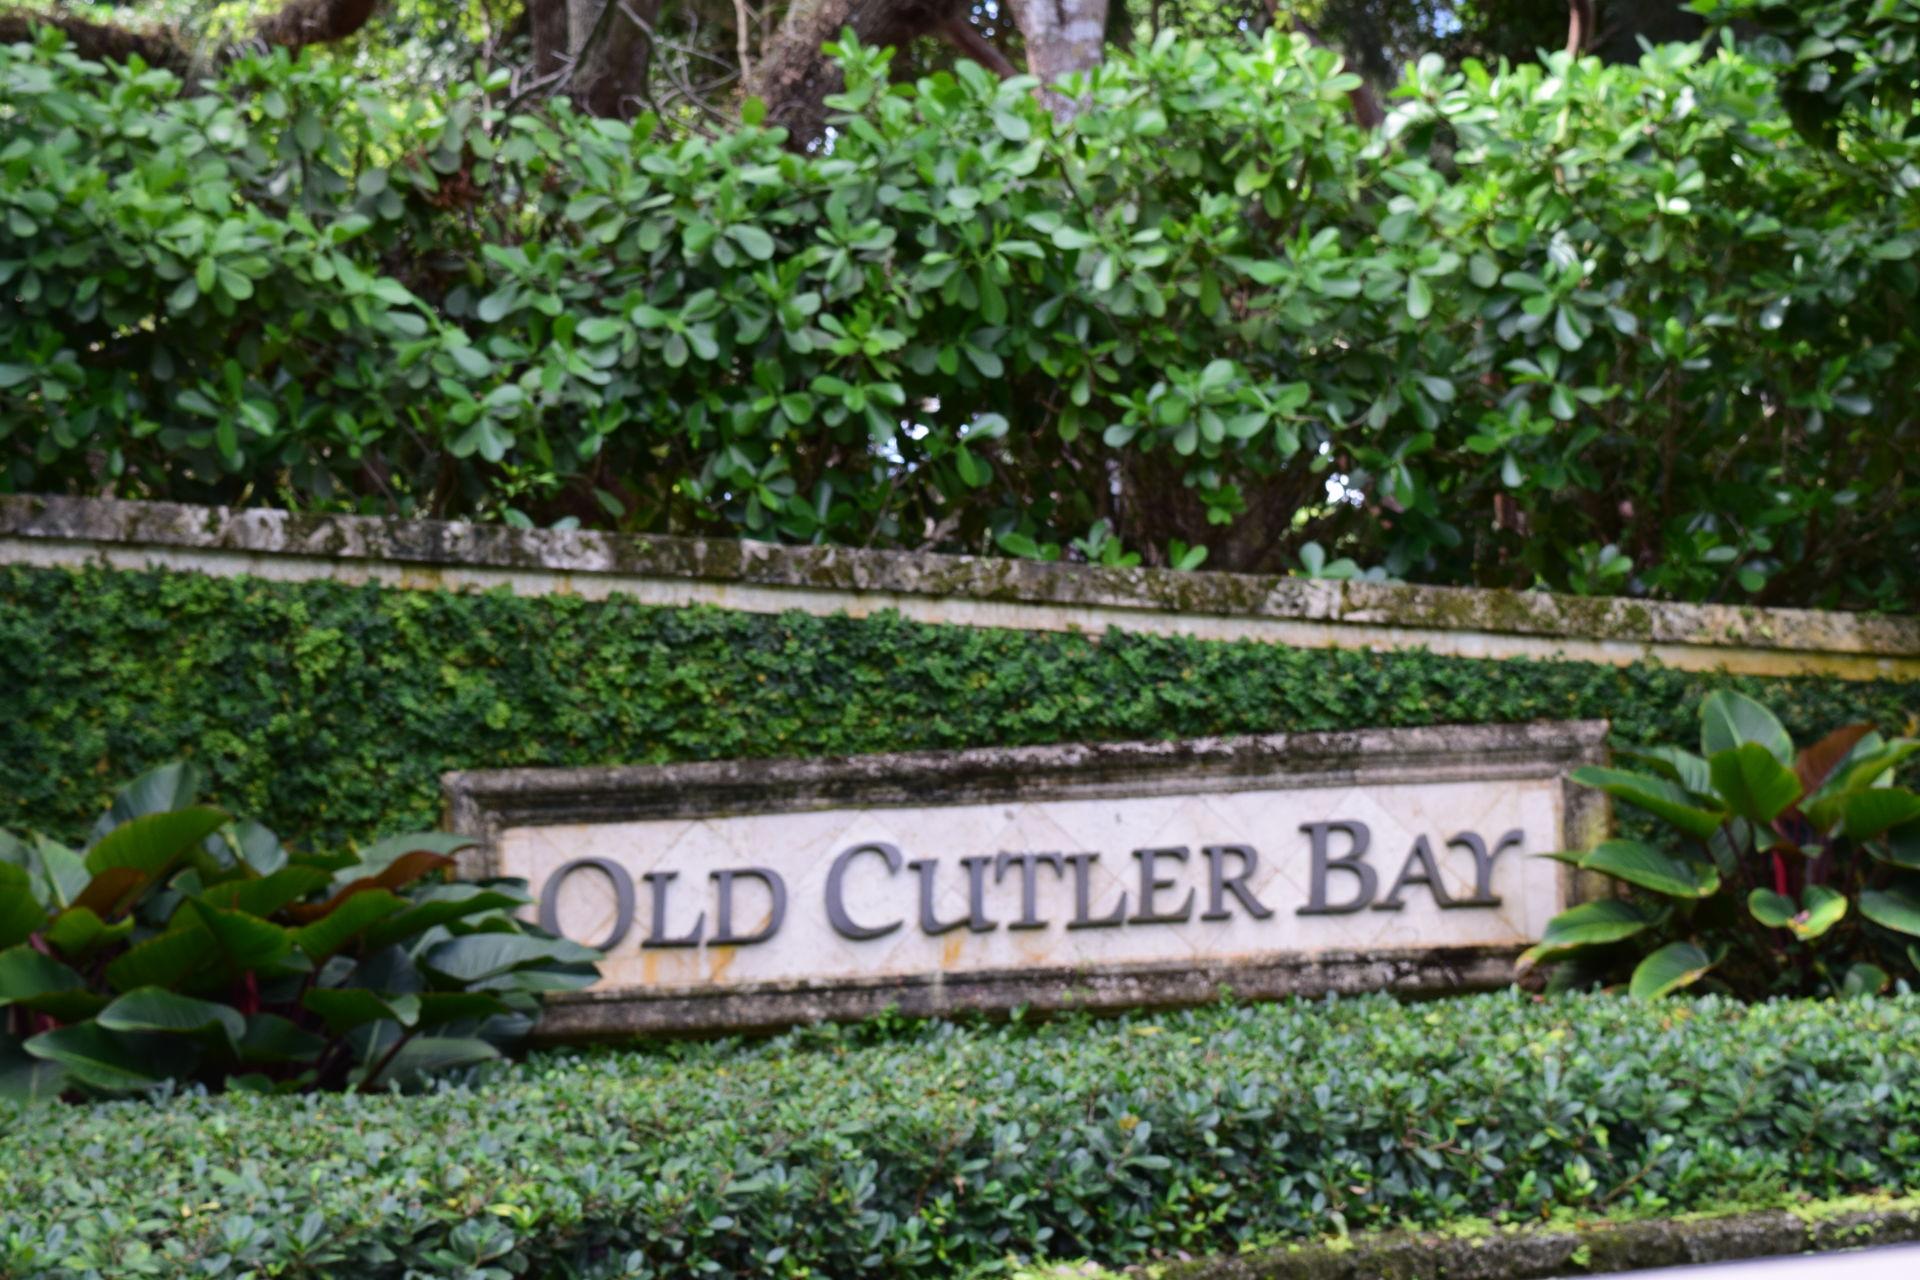 Old Cutler Bay sec 4